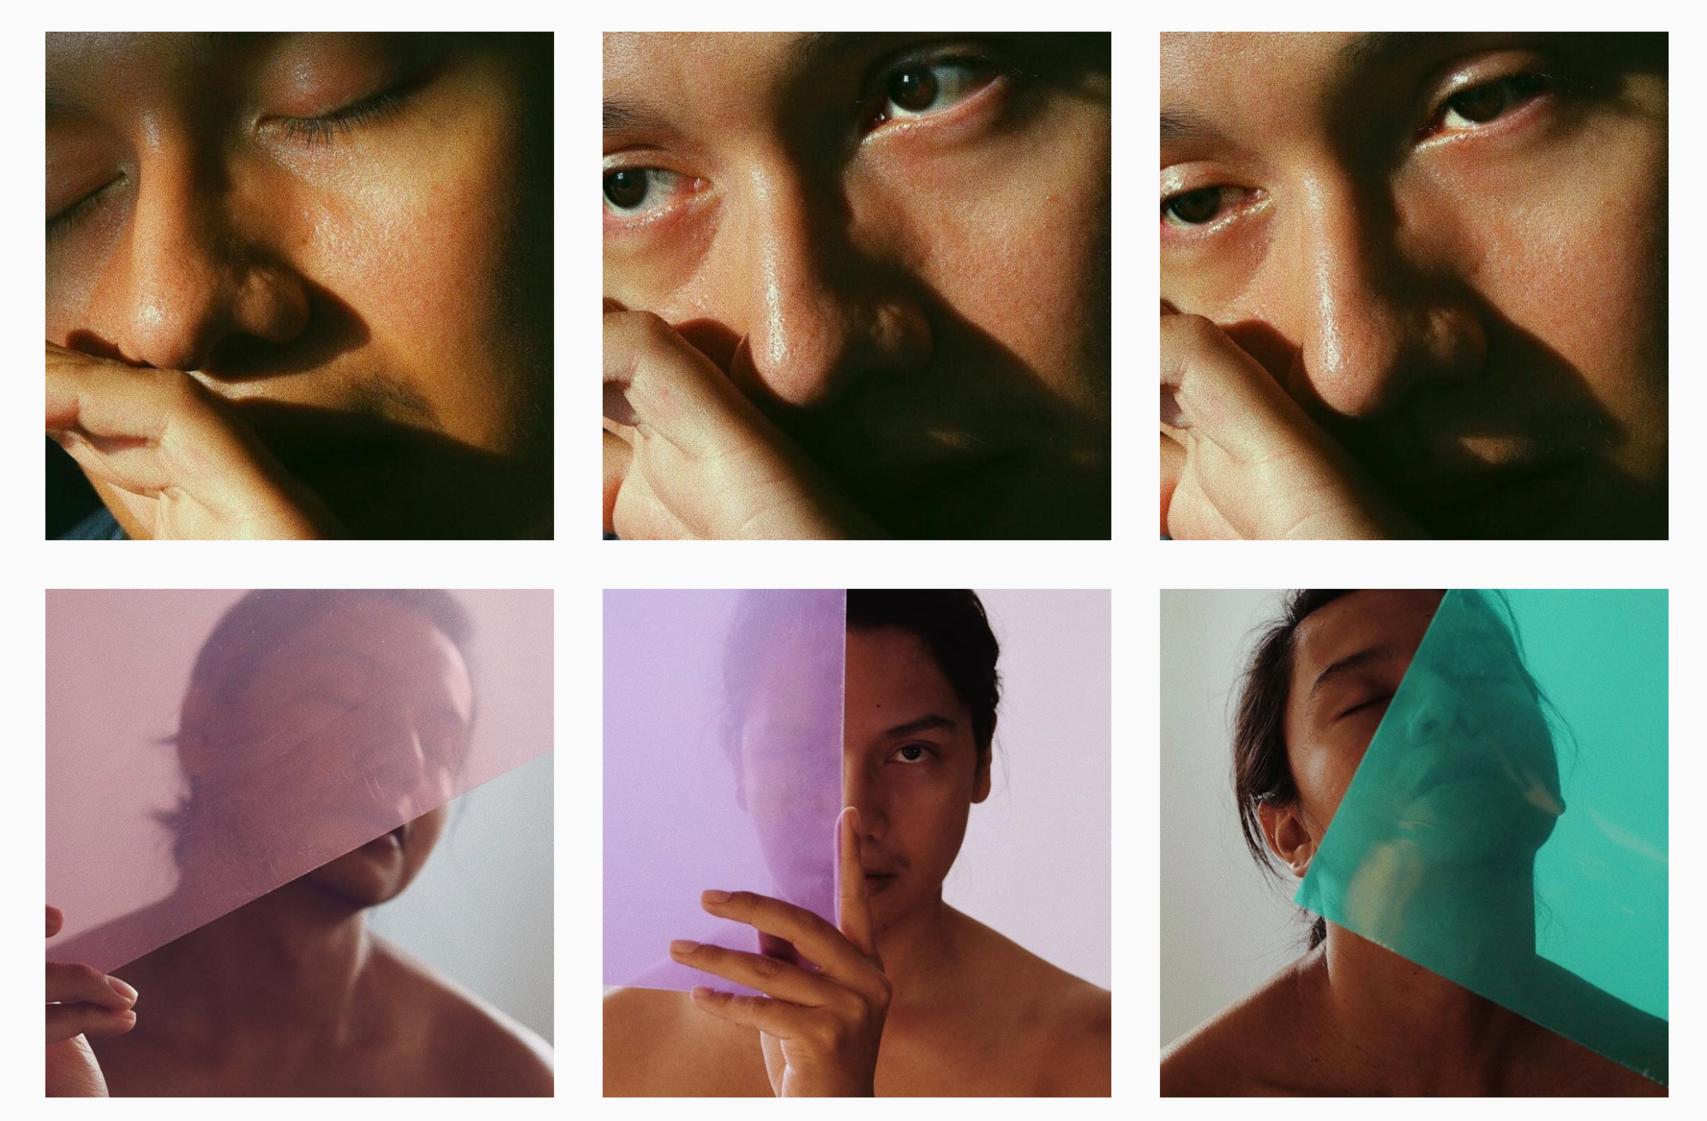 Raf Antonio (2017), 6 stills from collection.